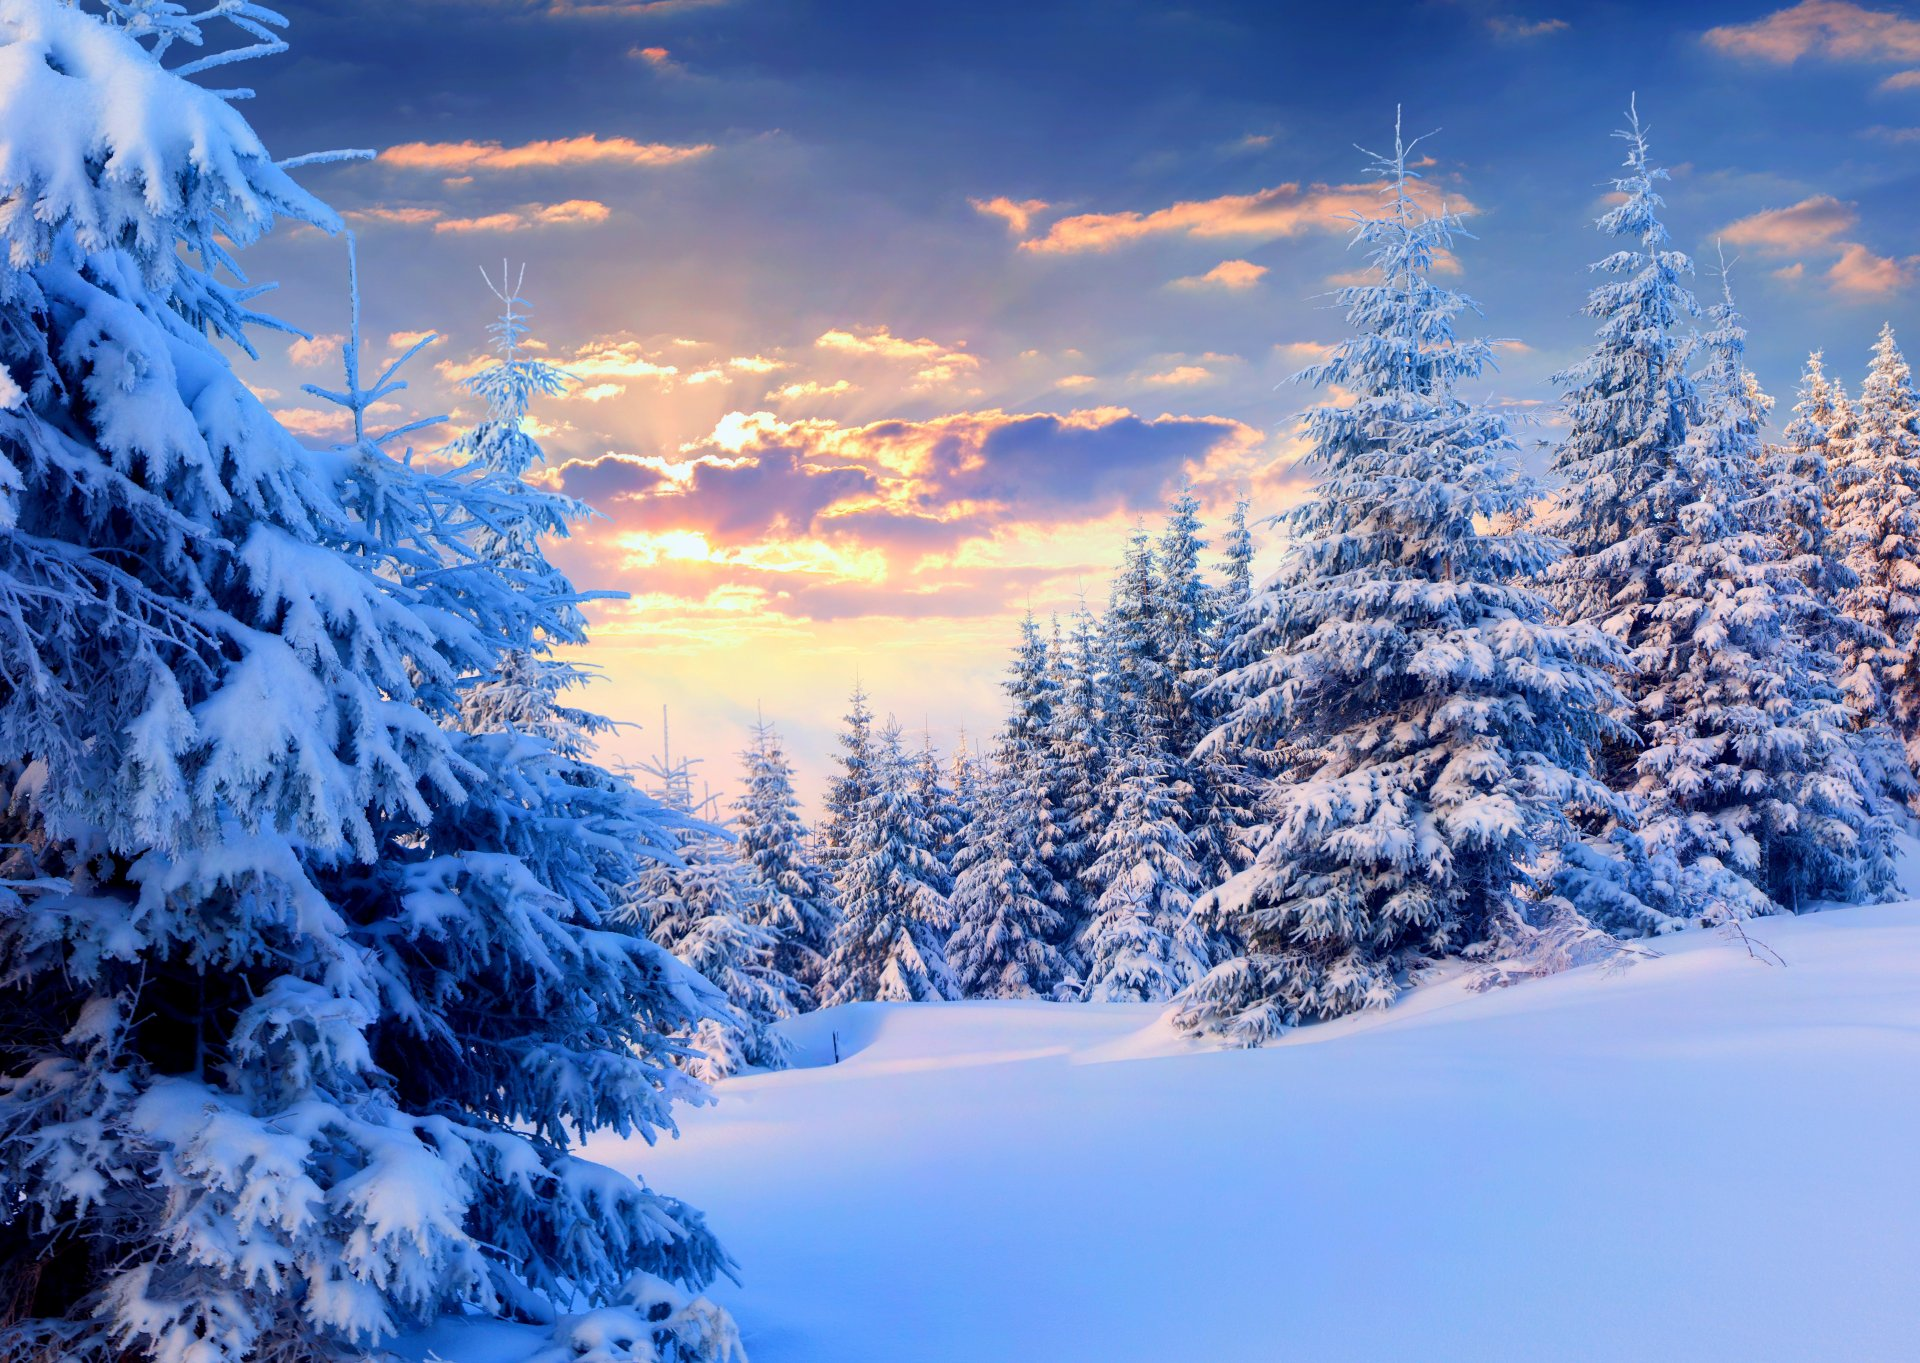 Картинки прекрасная зима